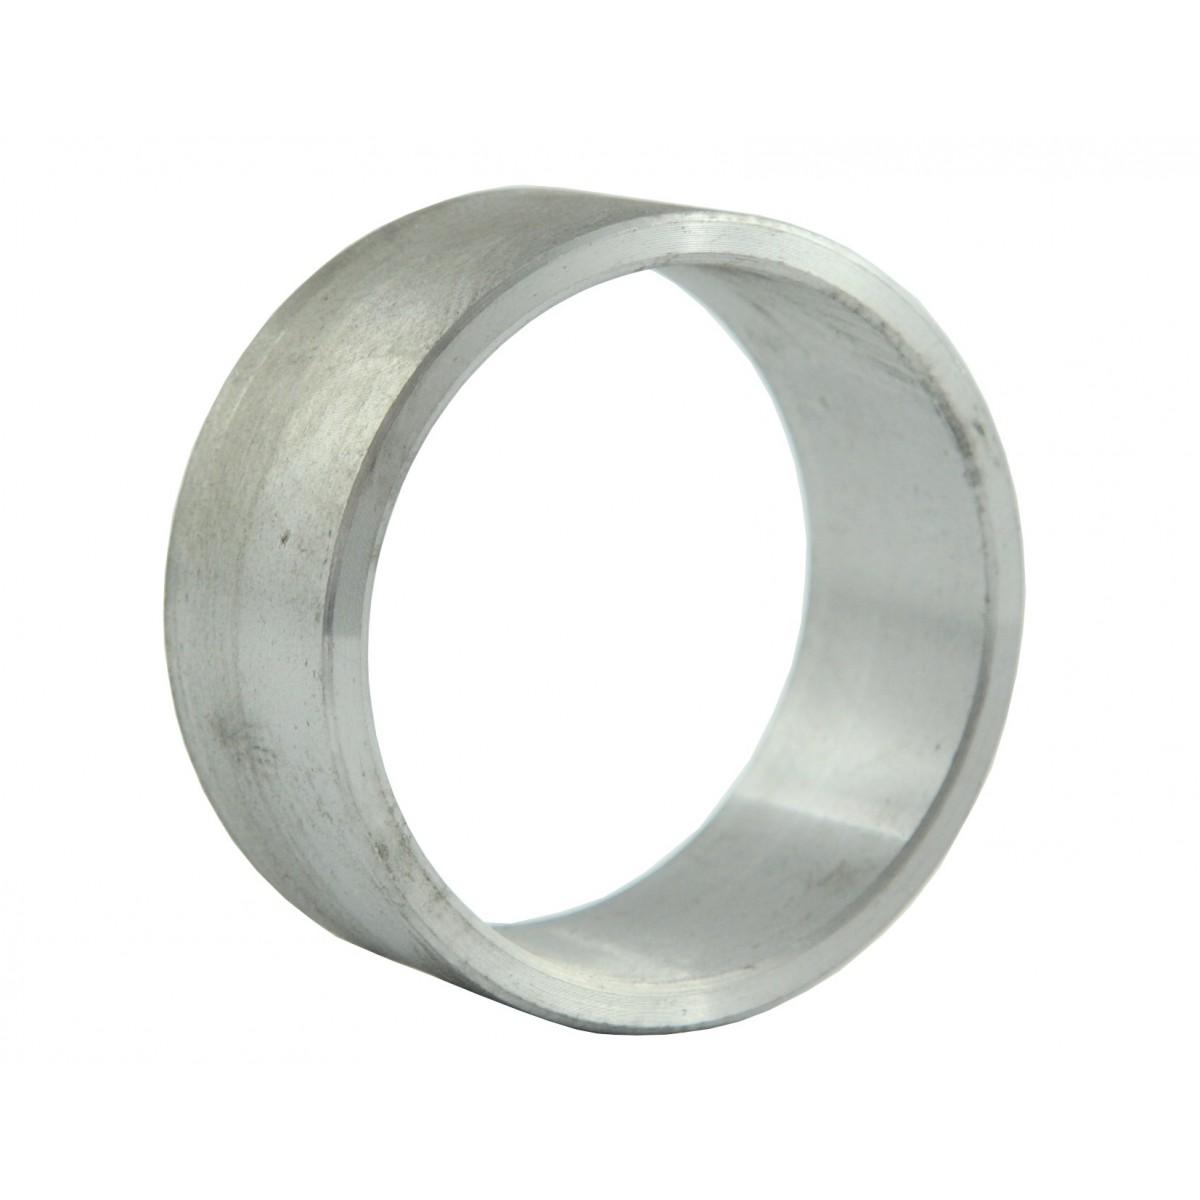 Sleeve bushing 25x52x60 mm ring